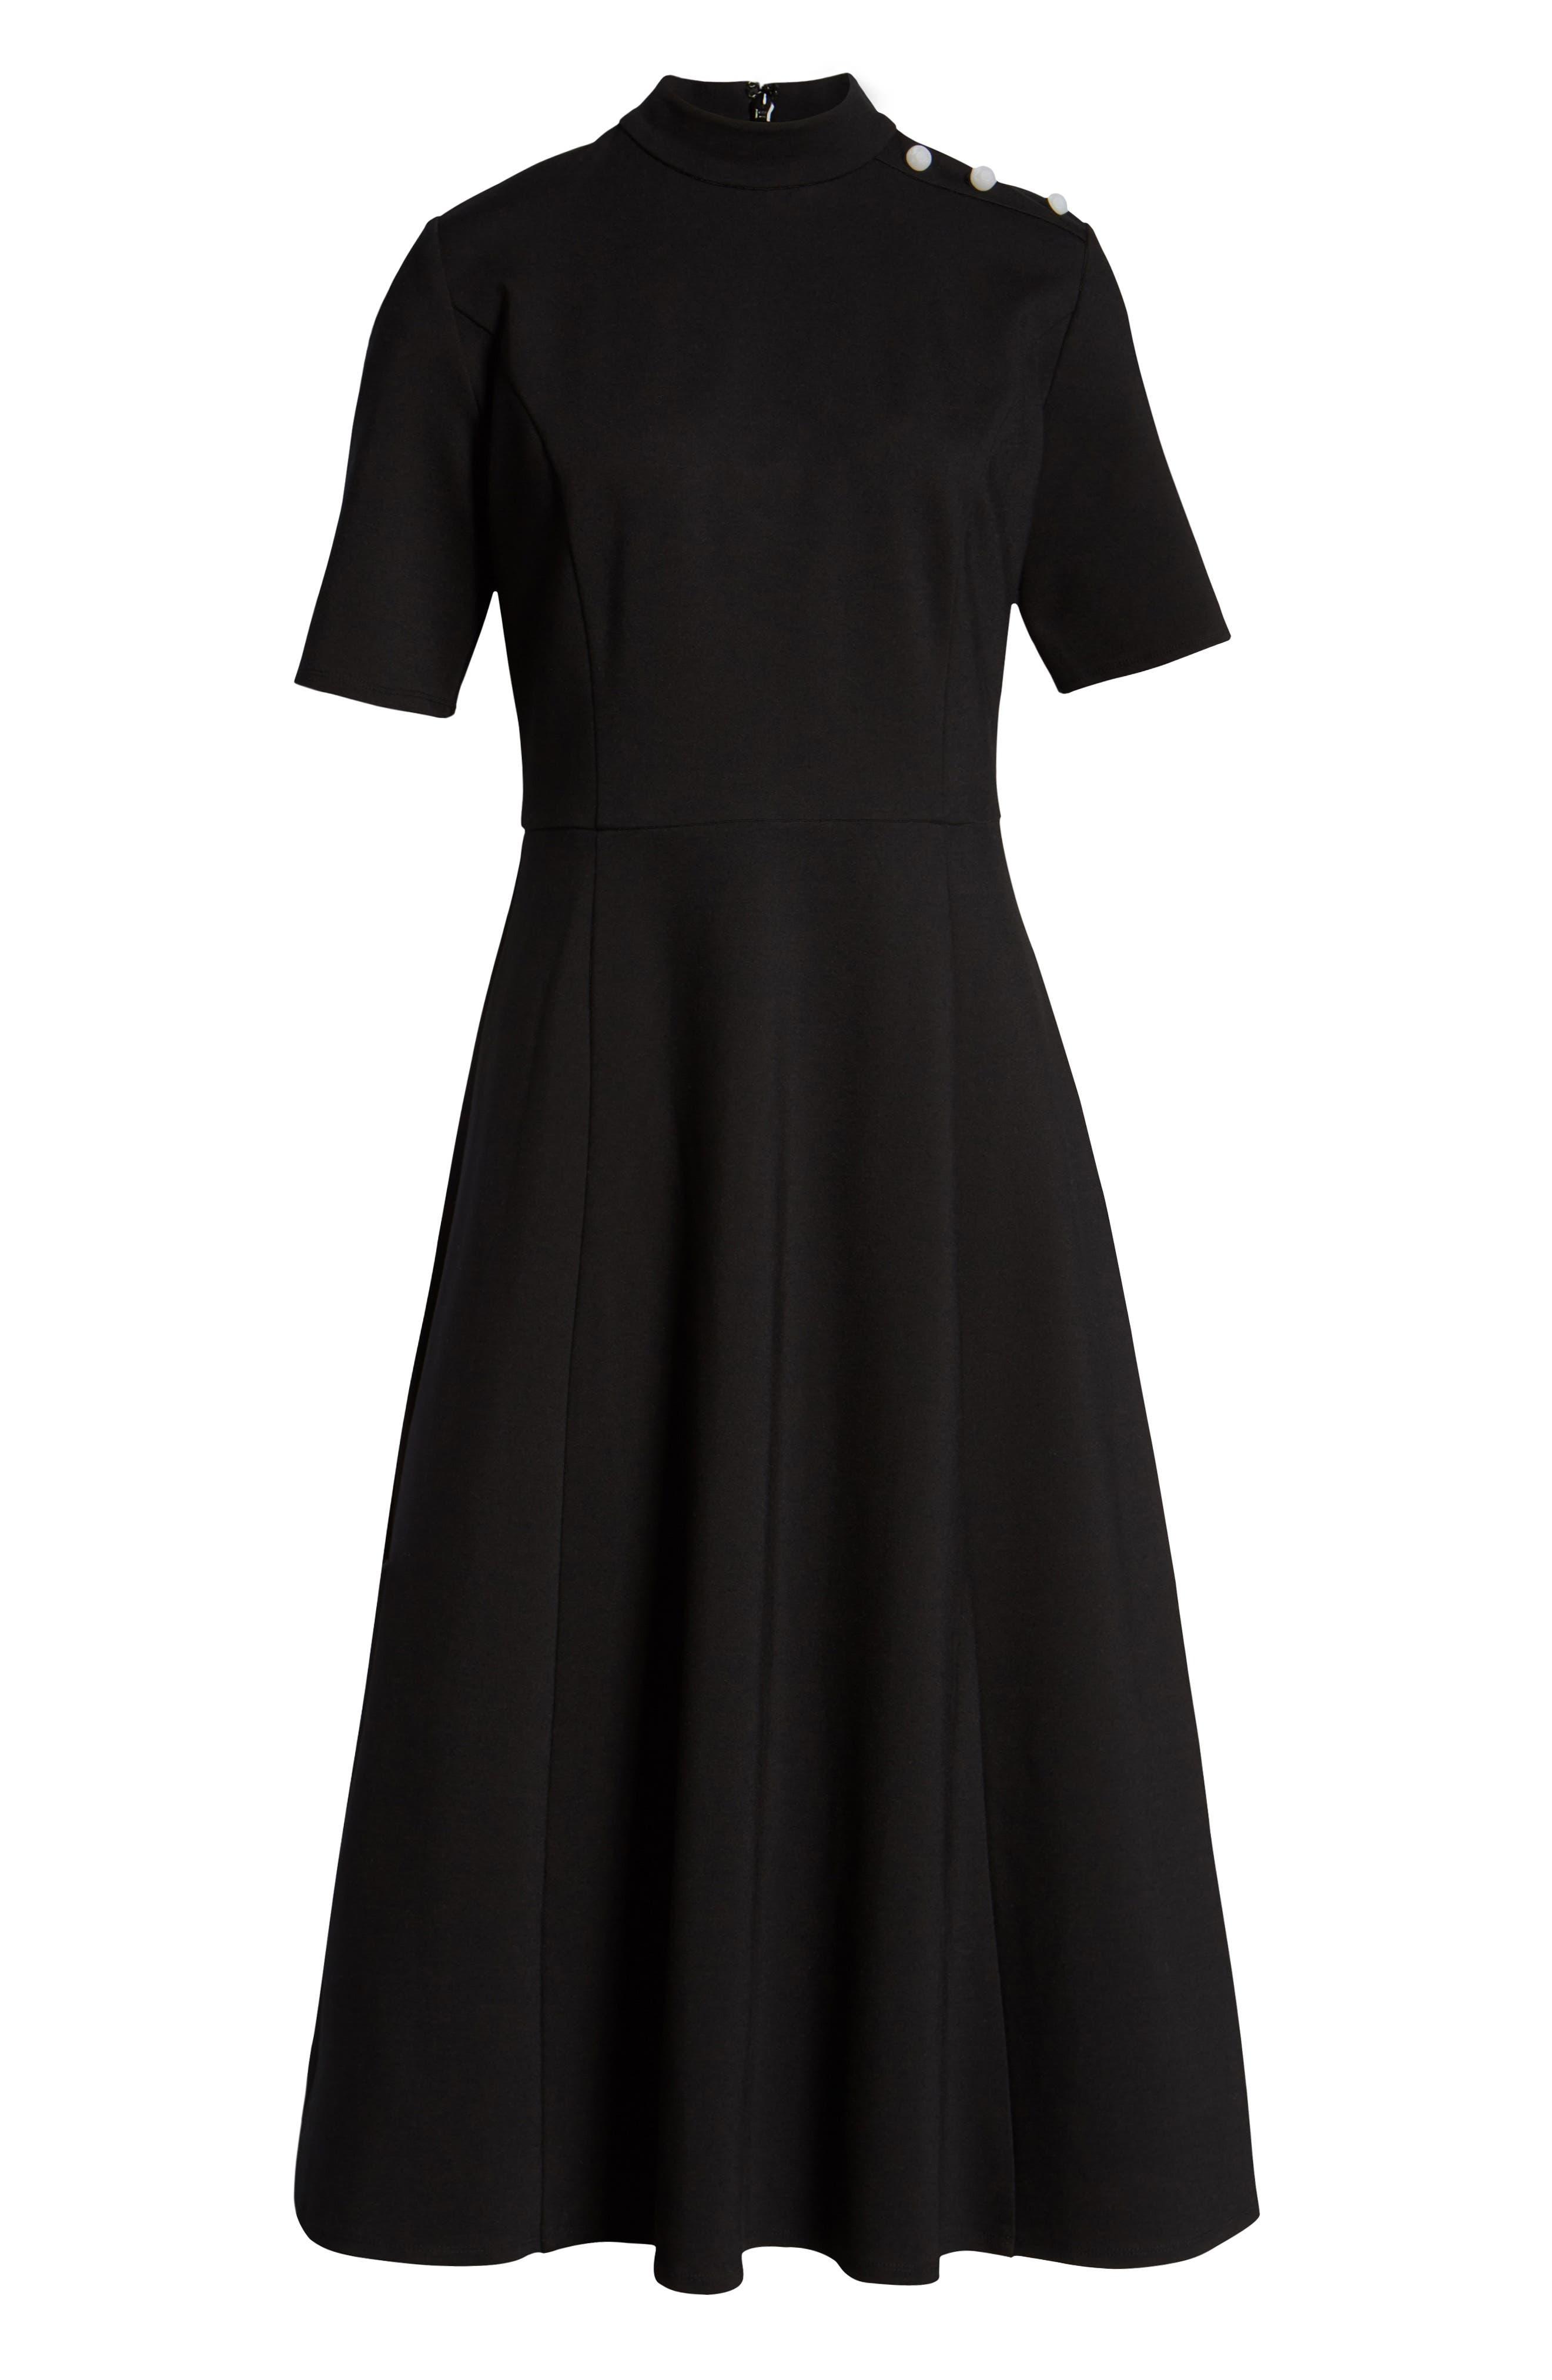 x Atlantic-Pacific Stretch Ponte Dress,                             Alternate thumbnail 7, color,                             001